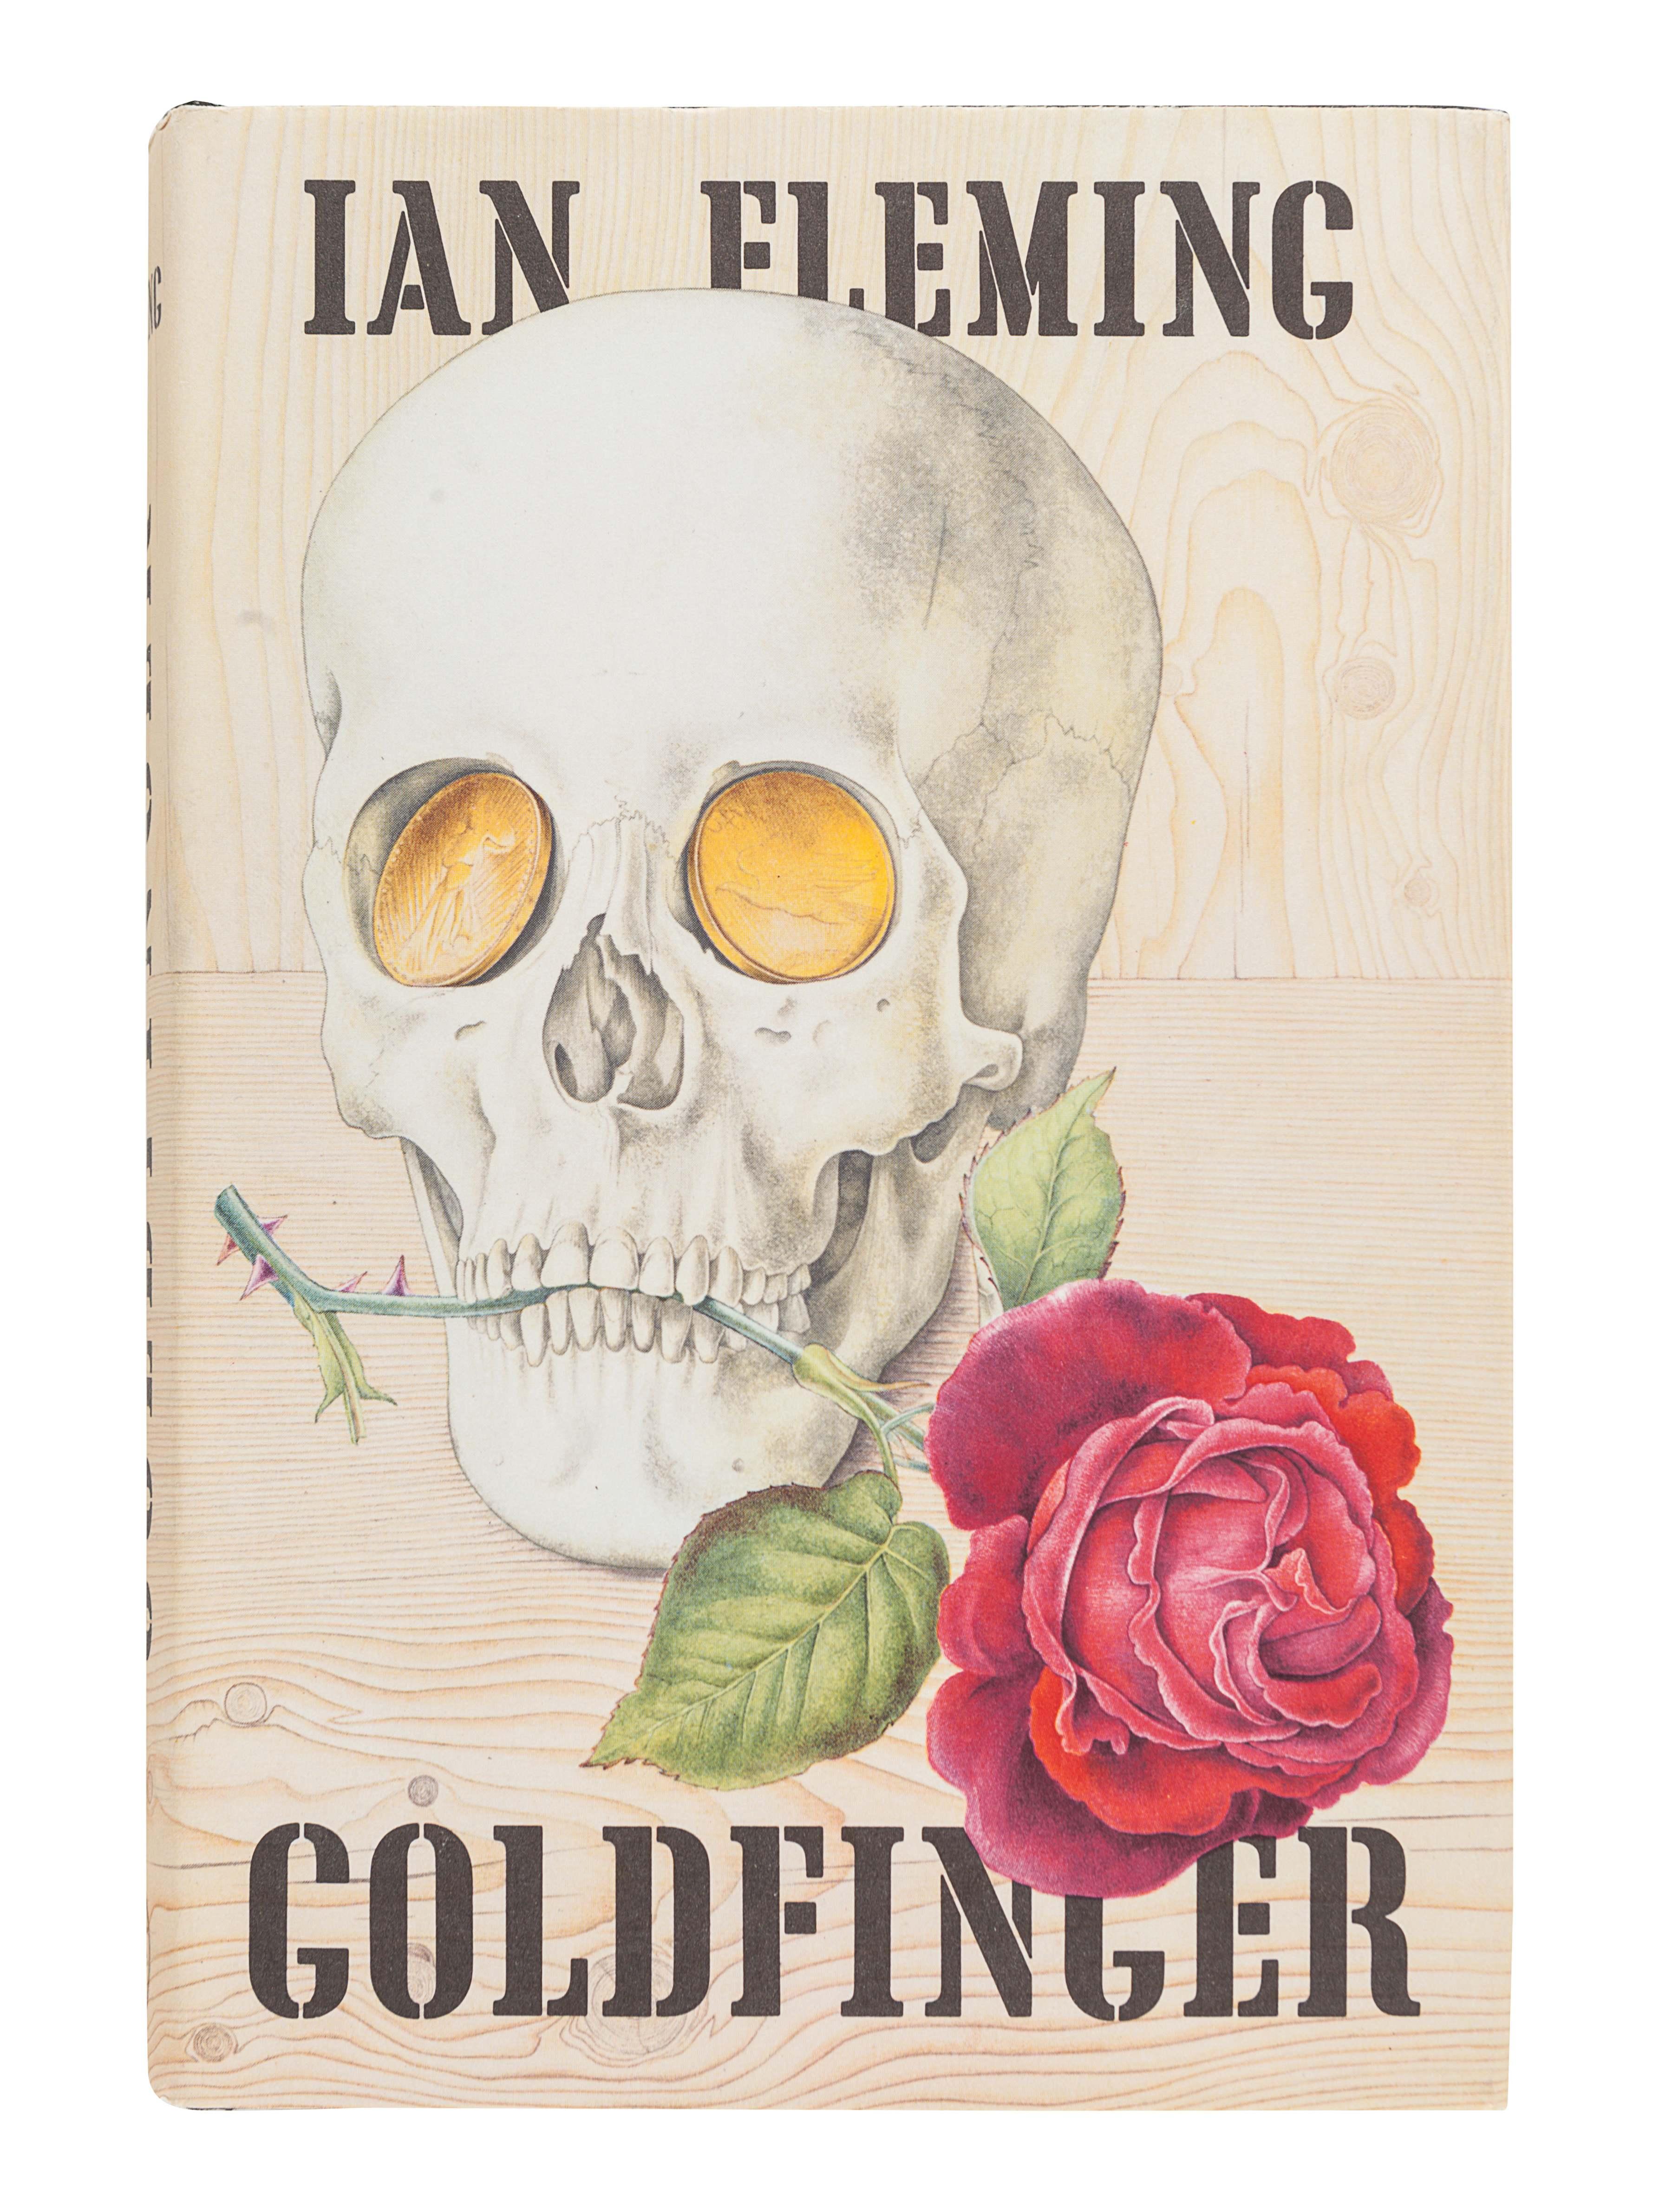 FLEMING, Ian (1908-1964). Goldfinger. London: Jonathan Cape, 1959. - Image 2 of 3